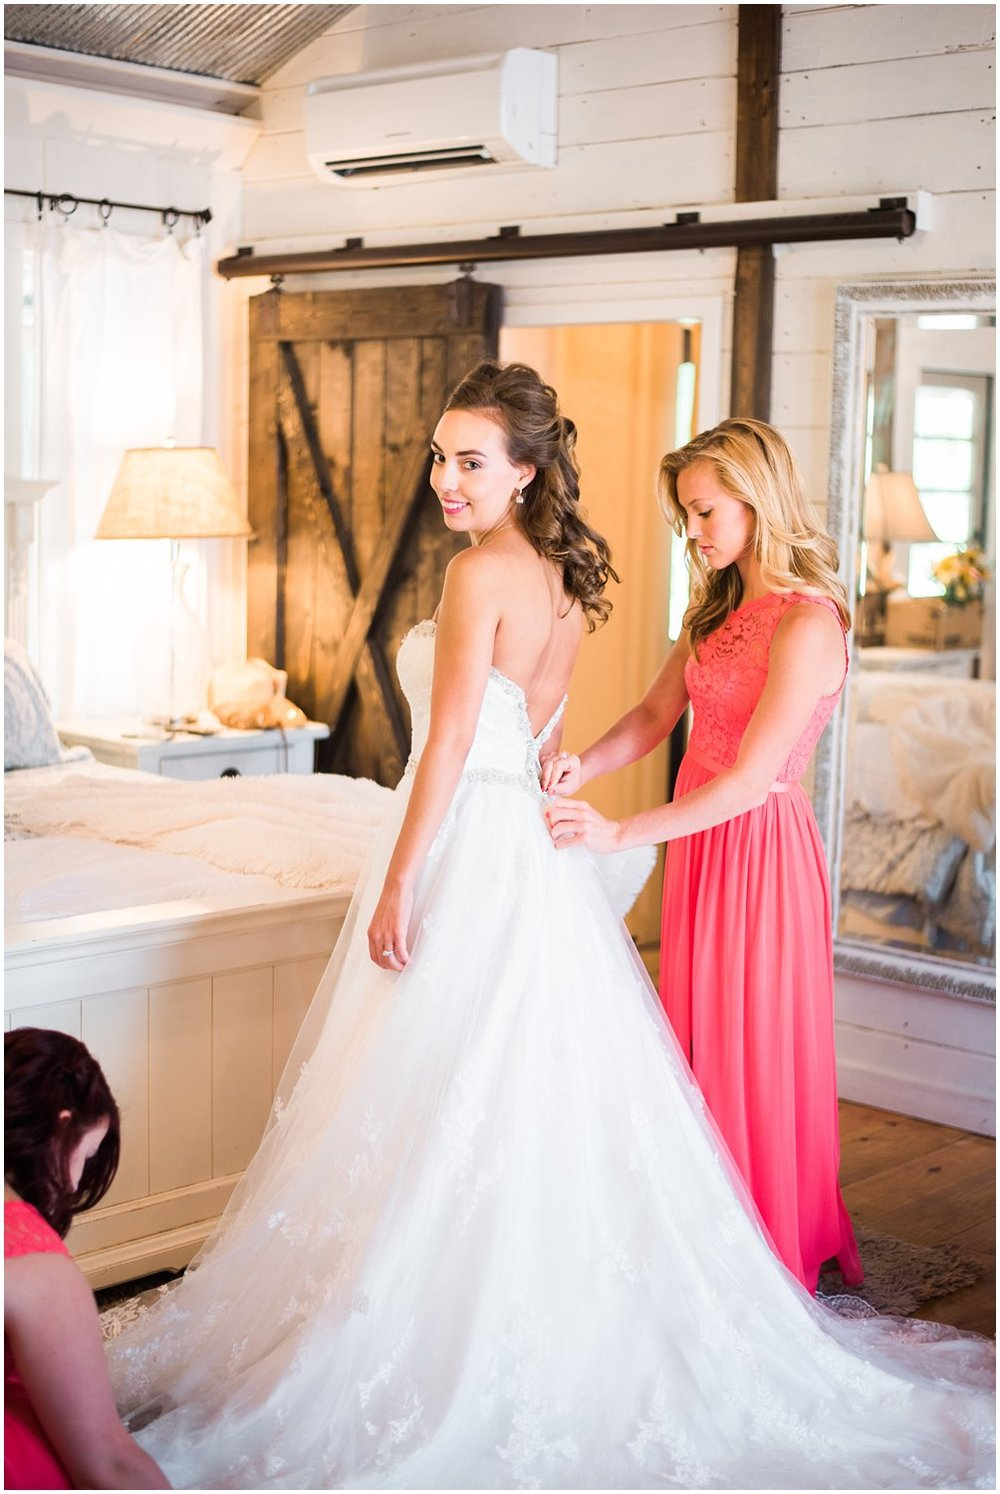 Kyle and Haley Wedding day at Loblolly Rise Plantation, Thomasville Georgia_0011.jpg